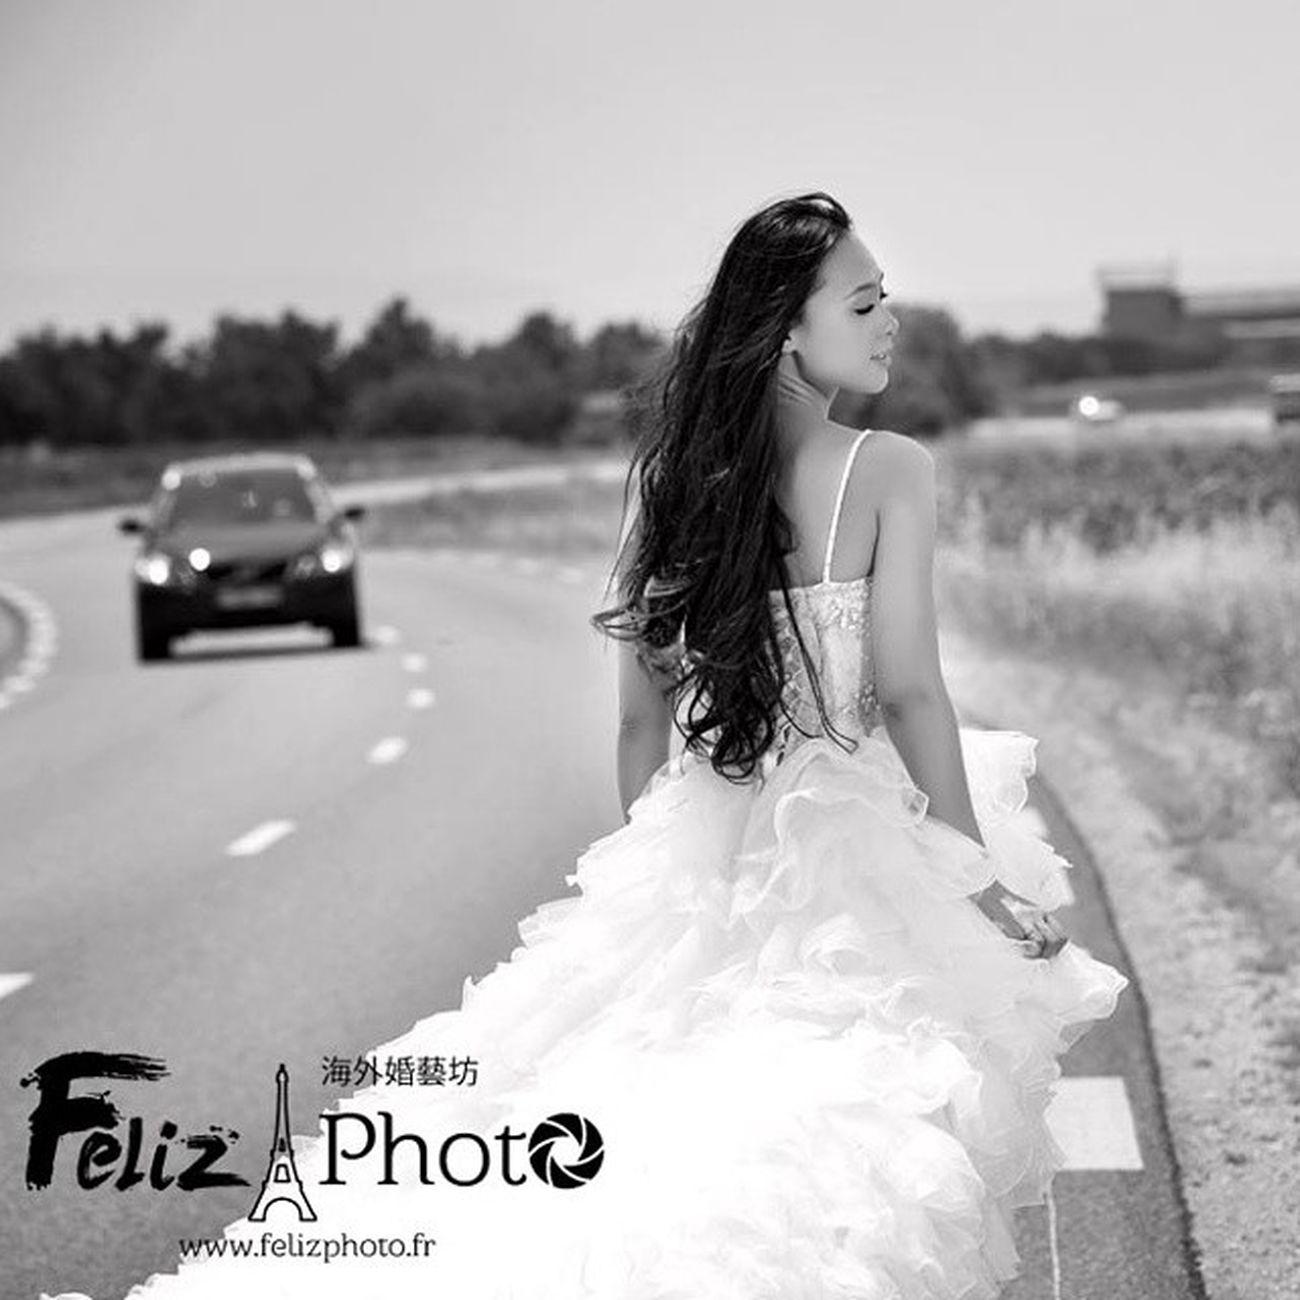 www.felizphoto.fr 也许你喜欢这样的风格.也许你希望留下这样的回忆.......那么我在巴黎等你...... Maybe you like this style..... so I'm waiting for you in Paris...... CL Bottegaveneta Burberry Chanel CELINECHLOEDIORFENDIRVGIVENCHYHERMESMIUMIUPRADAshowstreetshotphotographymenoryweddingFashion日记秀时尚摄影回忆记忆街拍婚礼巴黎